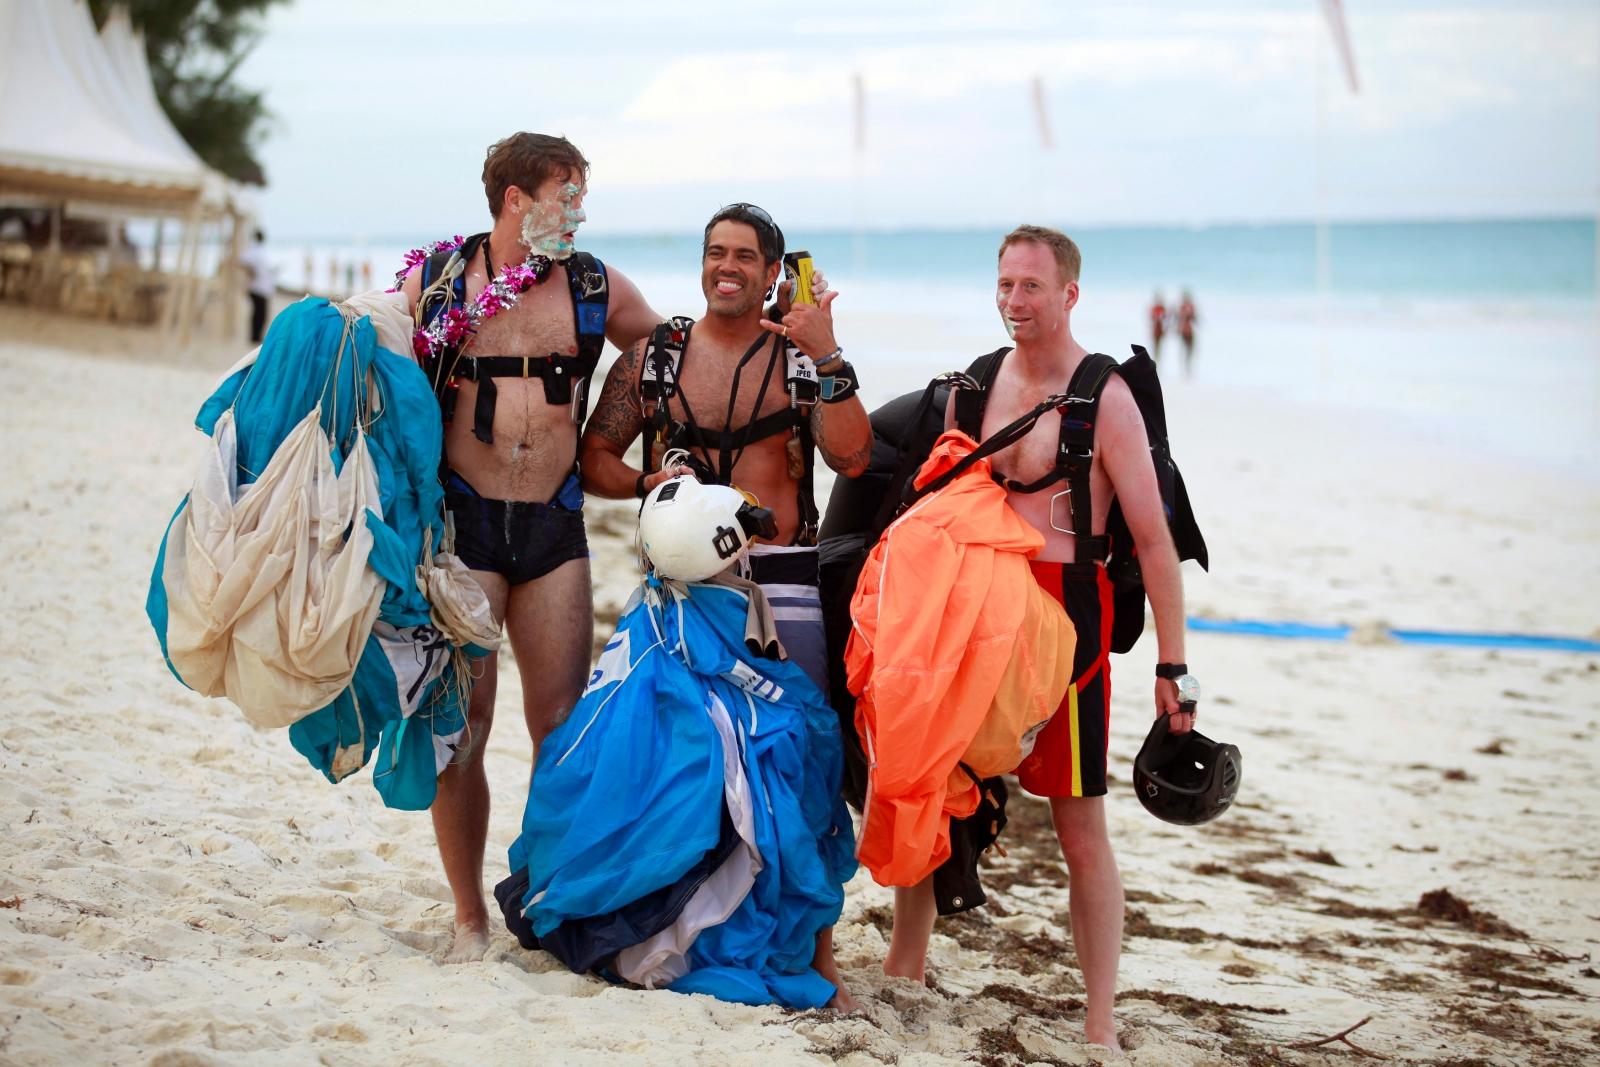 Naked British skydivers